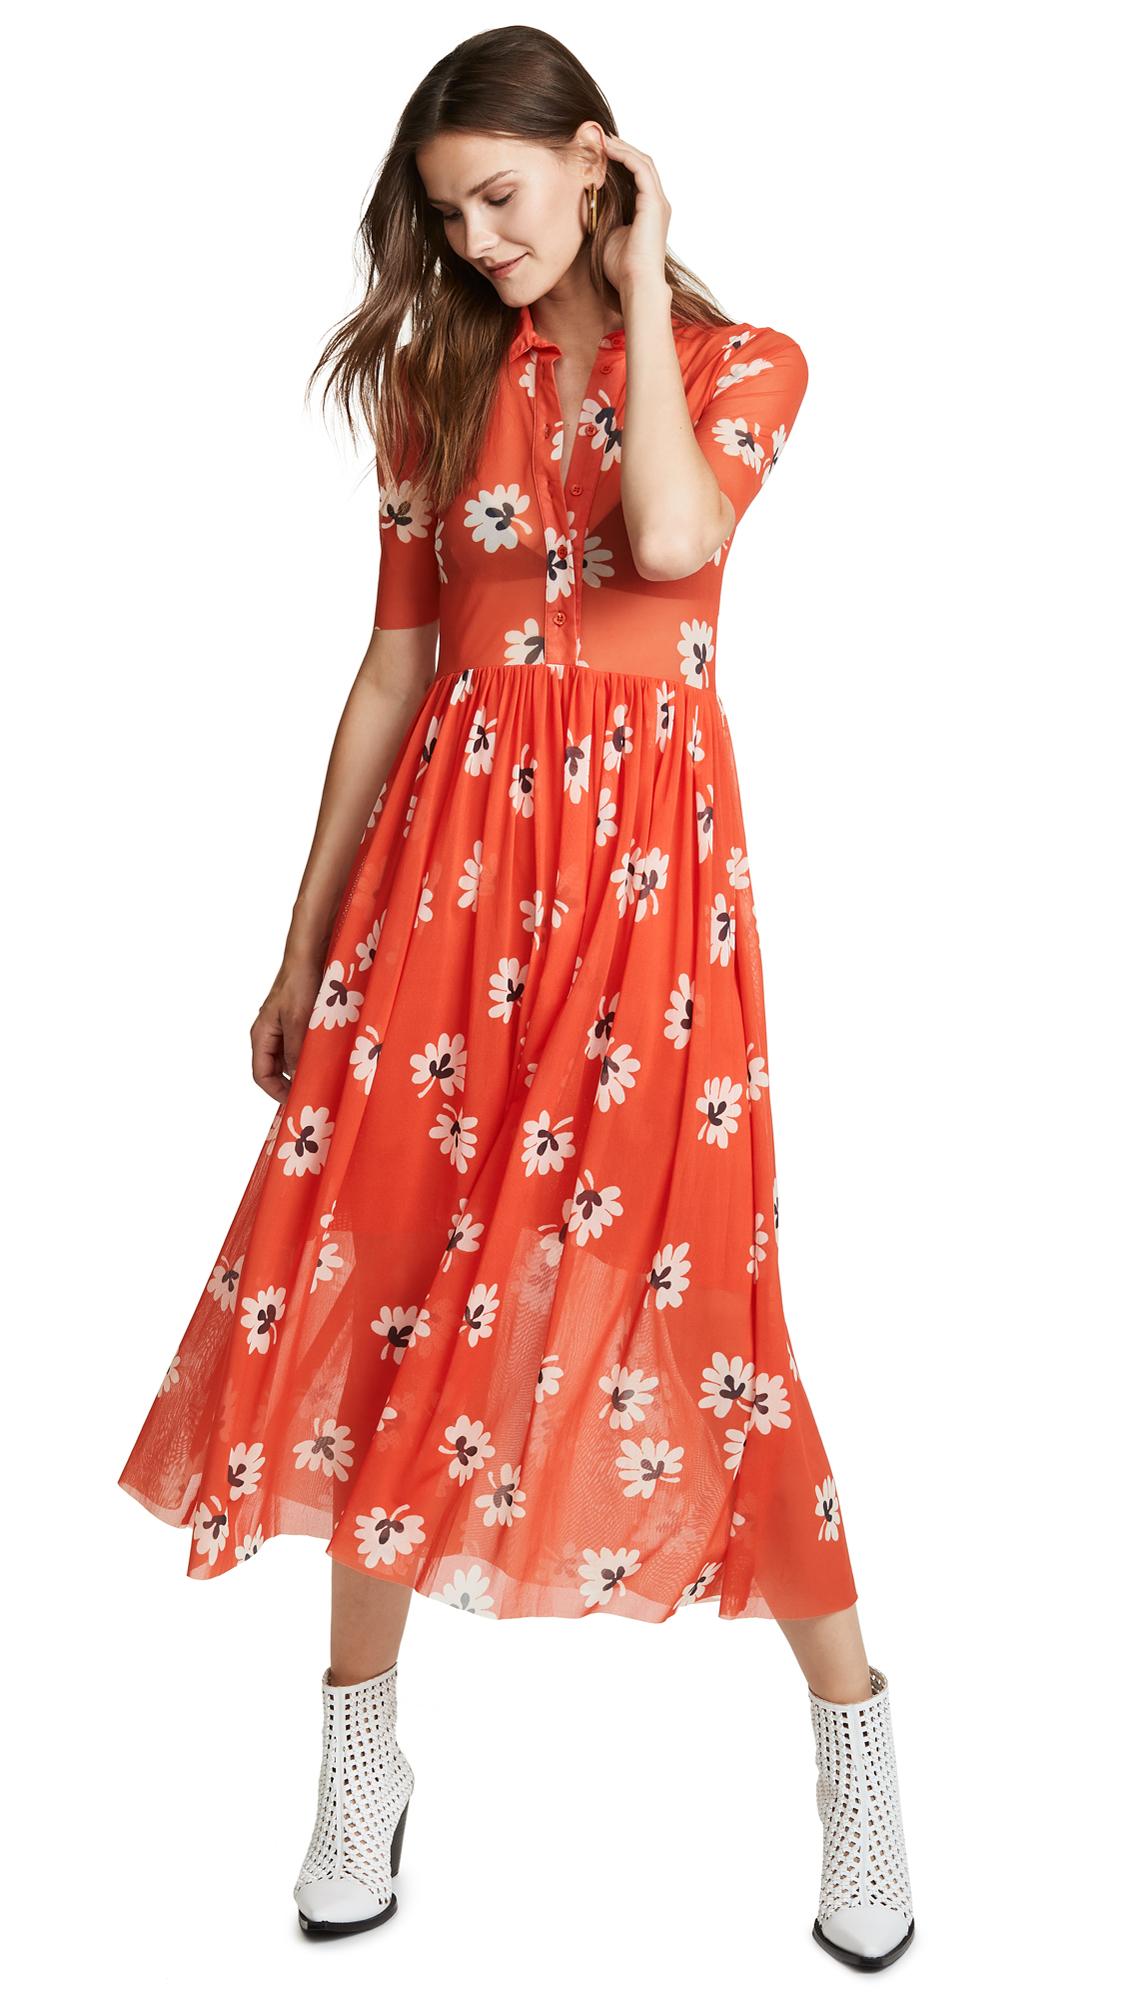 Ganni Tilden Dress In Big Apple Red